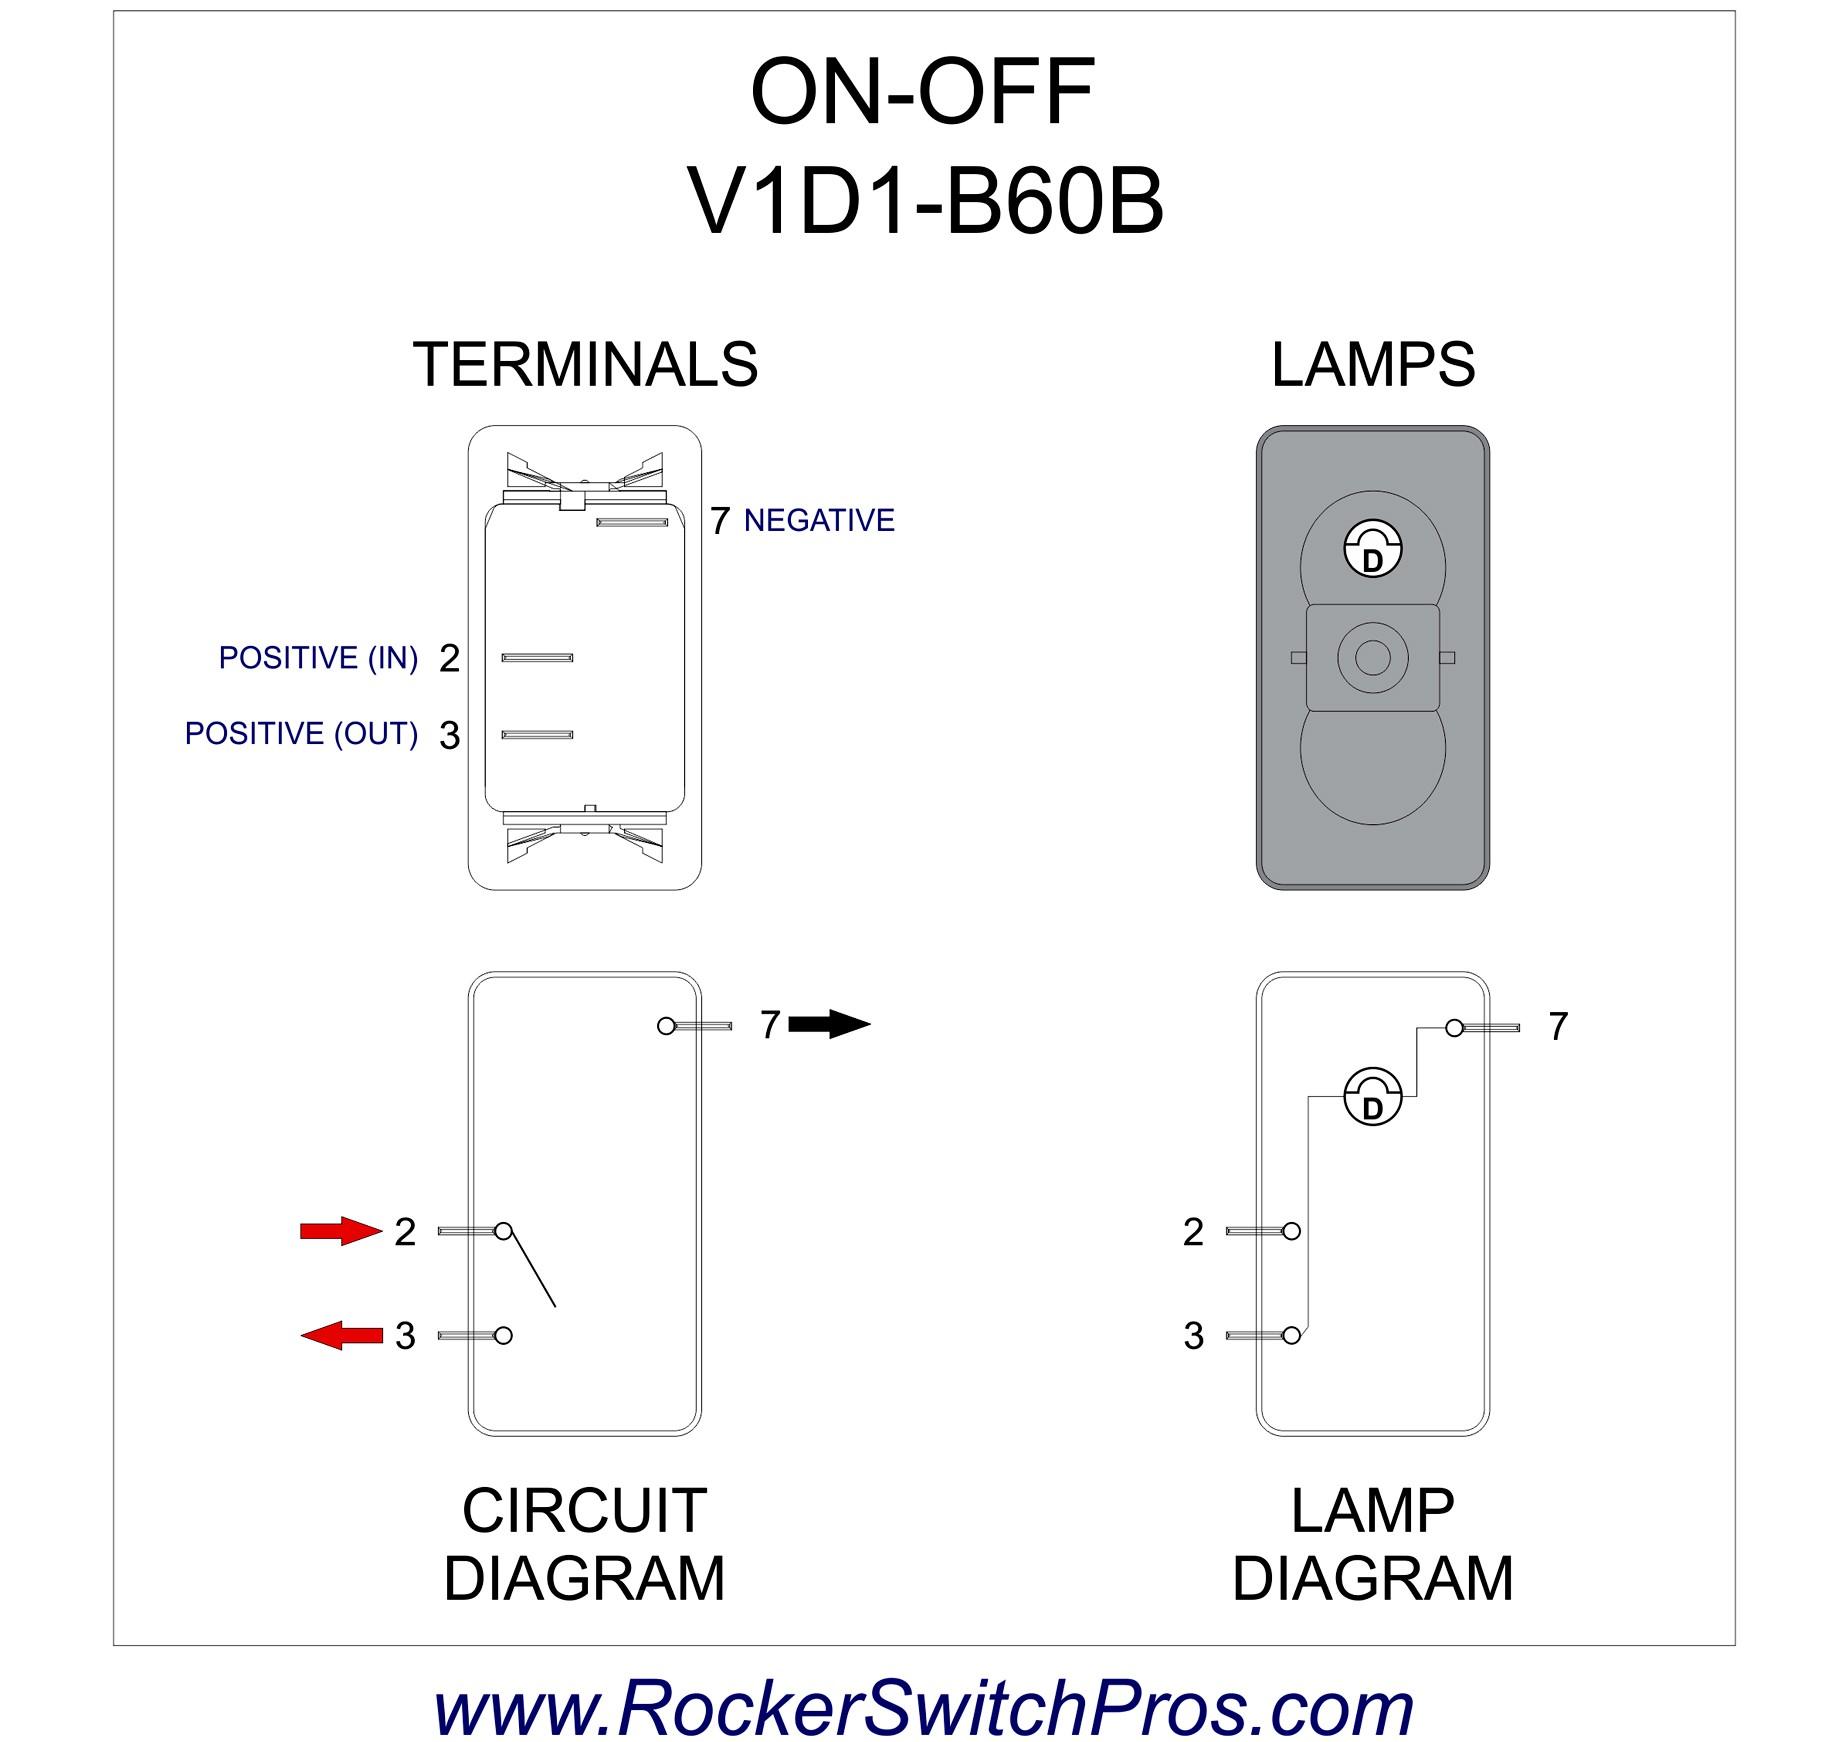 Wiring Diagram for Rocker Switch Rocker Switch On Off Spst 1 Dep Light V1d1 Brilliant Wiring Diagram Of Wiring Diagram for Rocker Switch